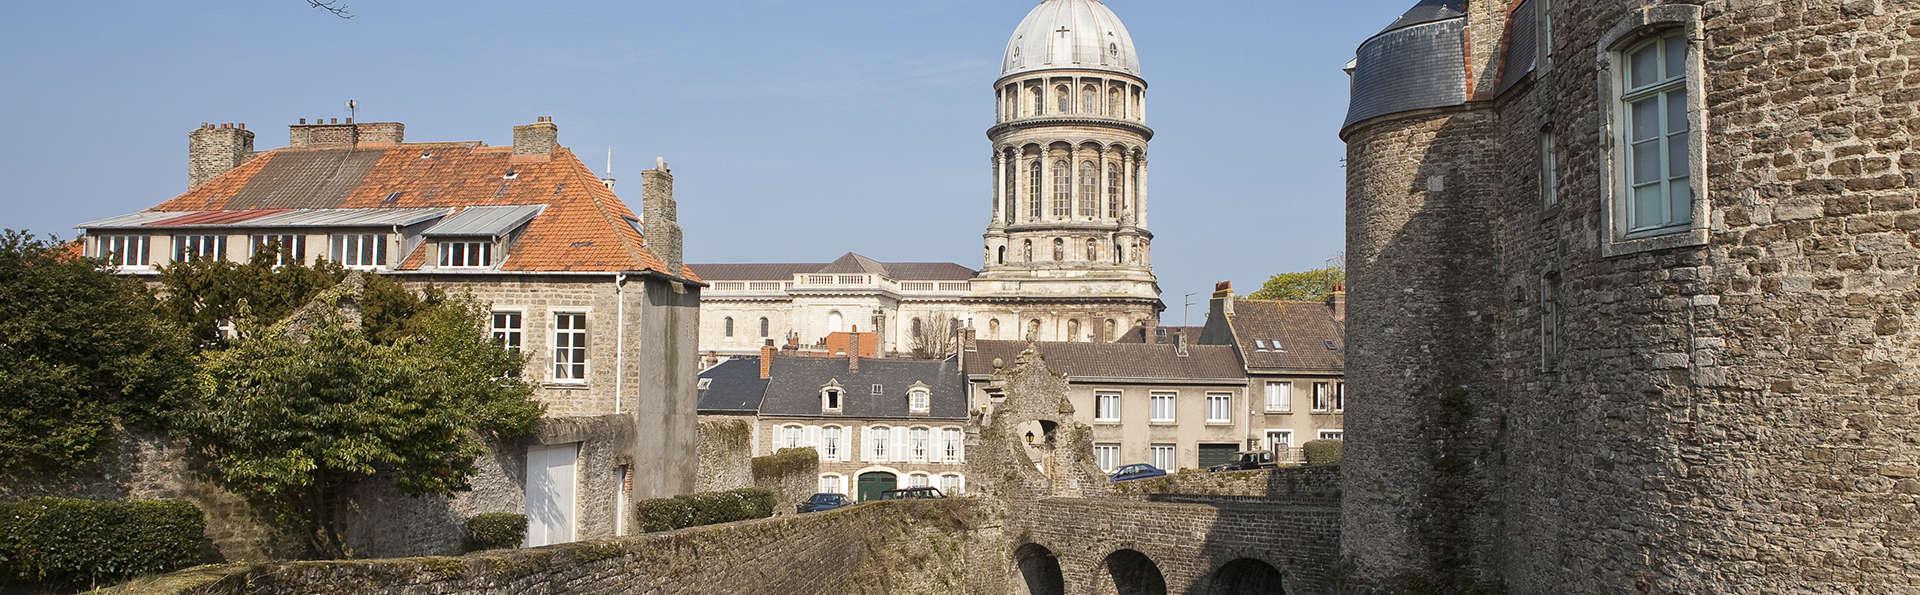 Najeti Hôtel Château Cléry - Edit_Boulogne-sur-Mer.jpg